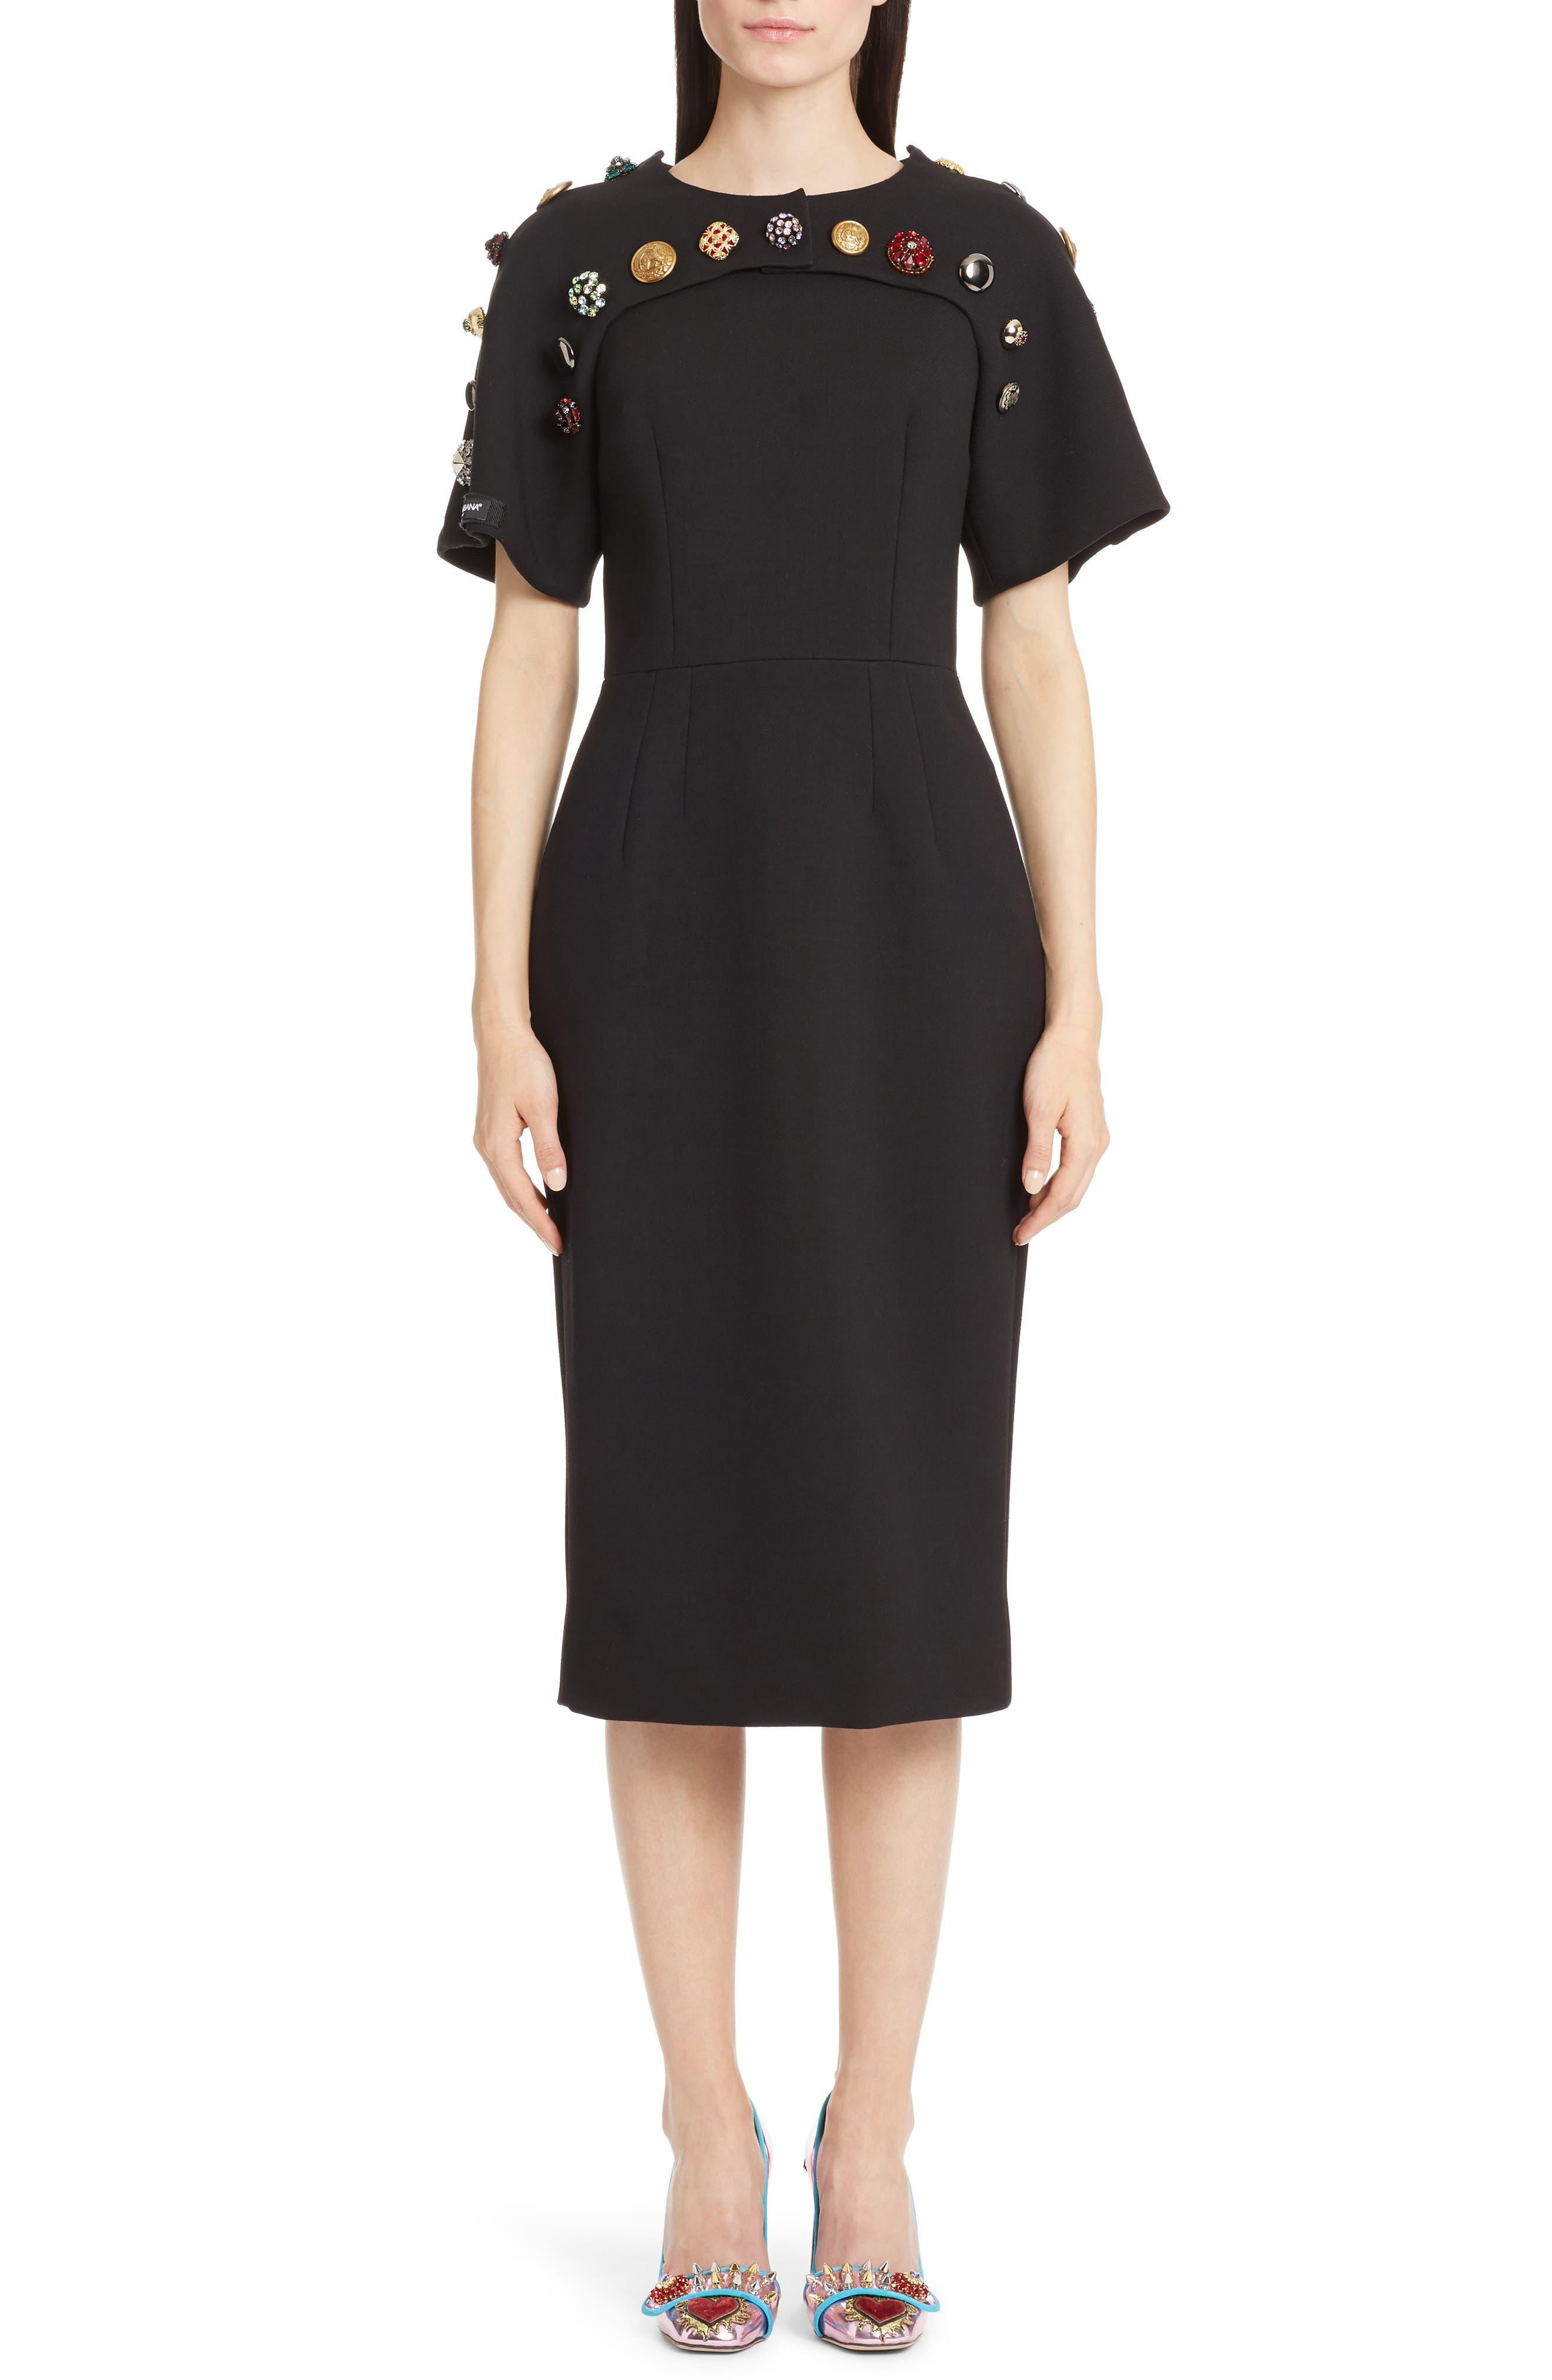 Dolce&Gabbana Button Trim Stretch Wool Sheath Dress